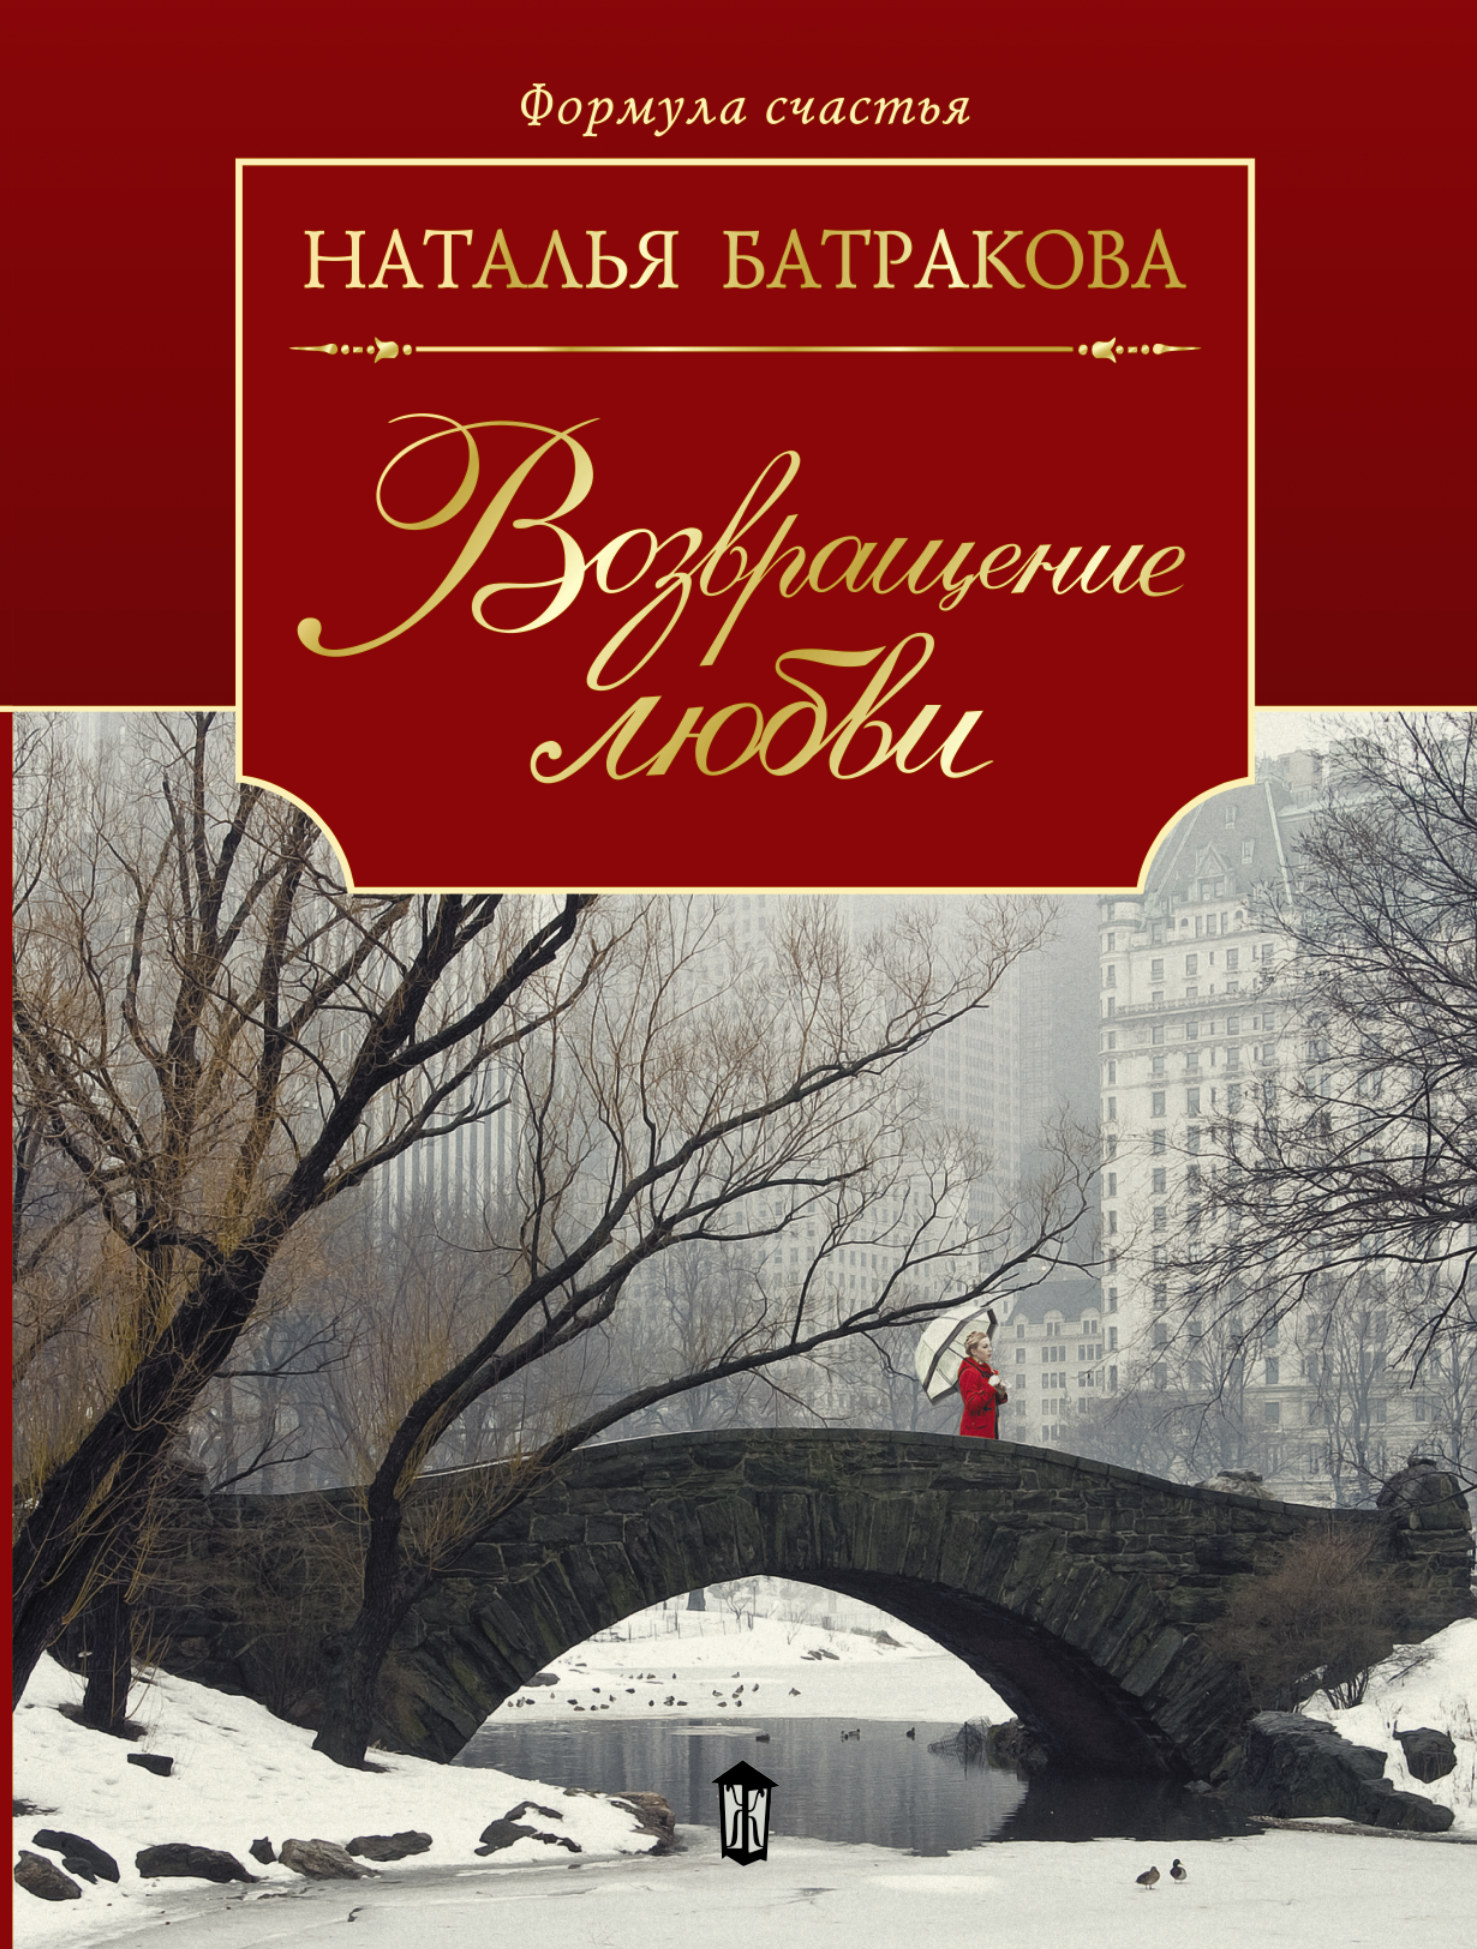 Батракова Н. Возвращение любви. Кн. 2